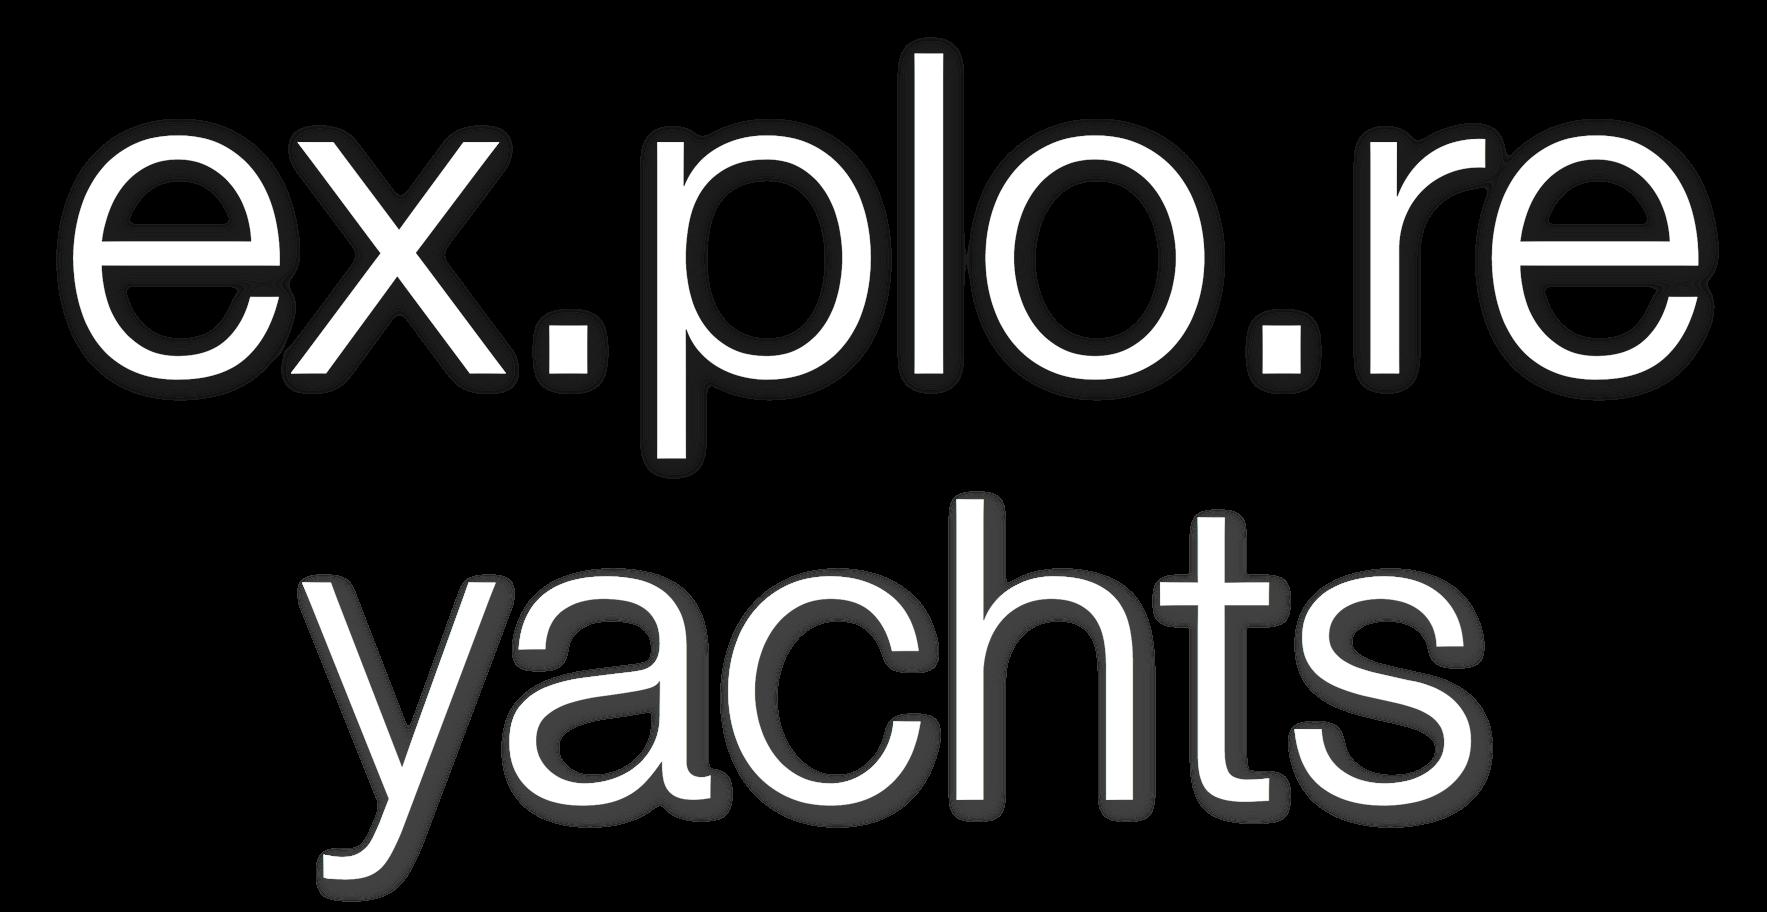 explore yachts